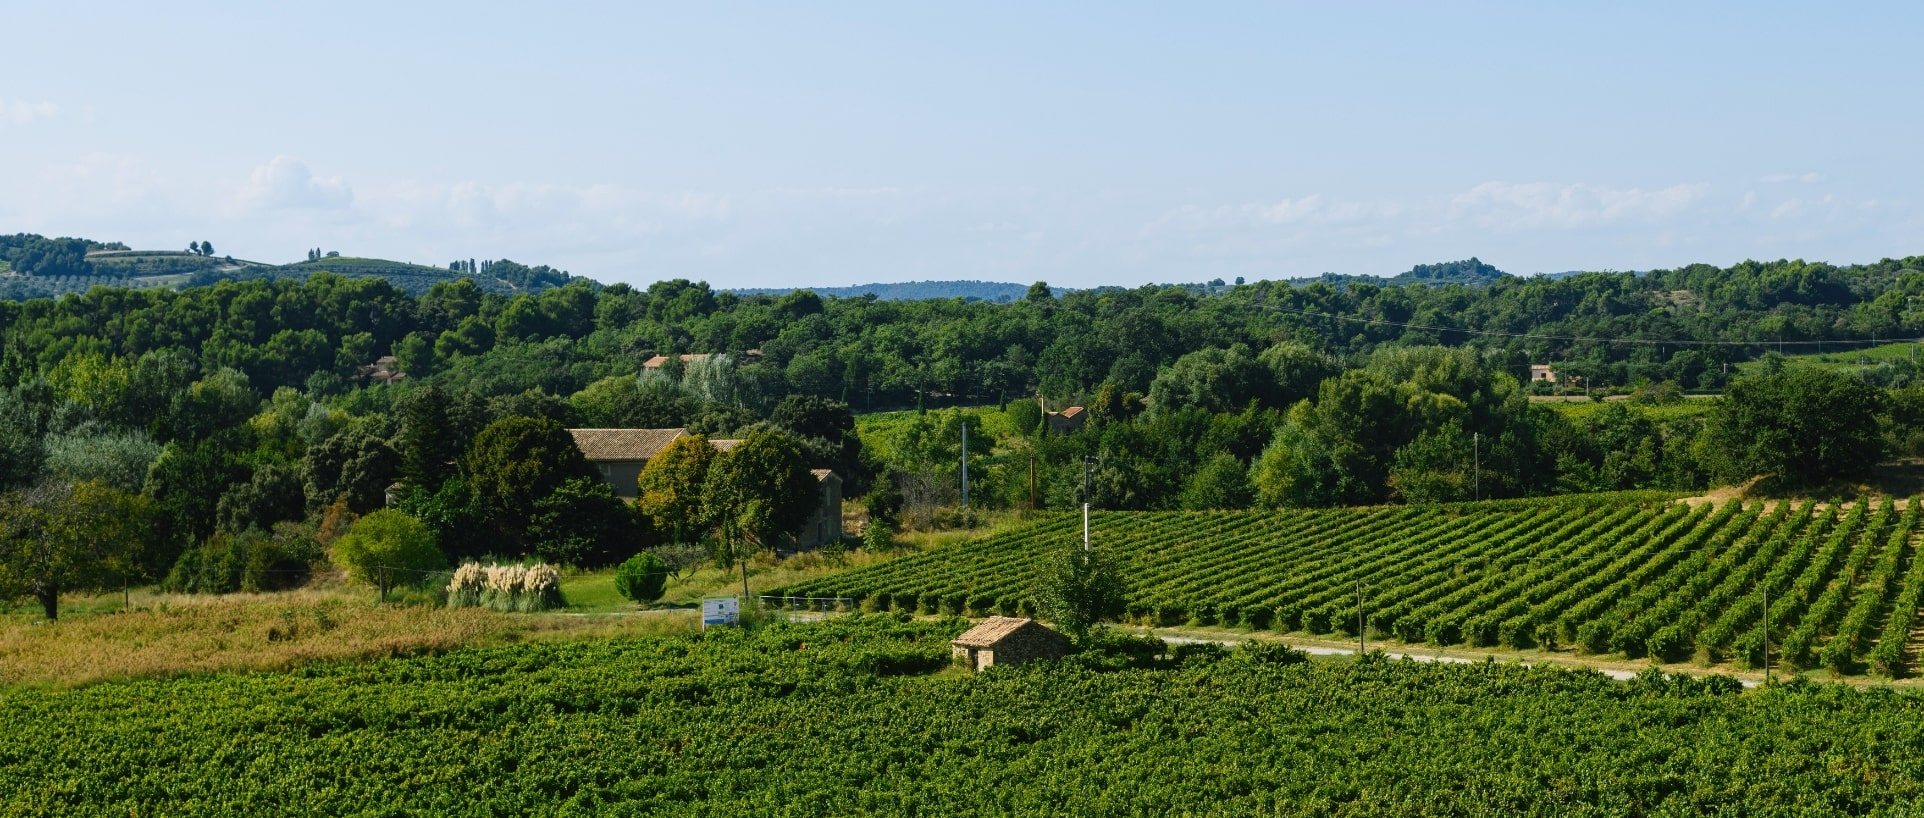 Photo panorama Champs de vigne